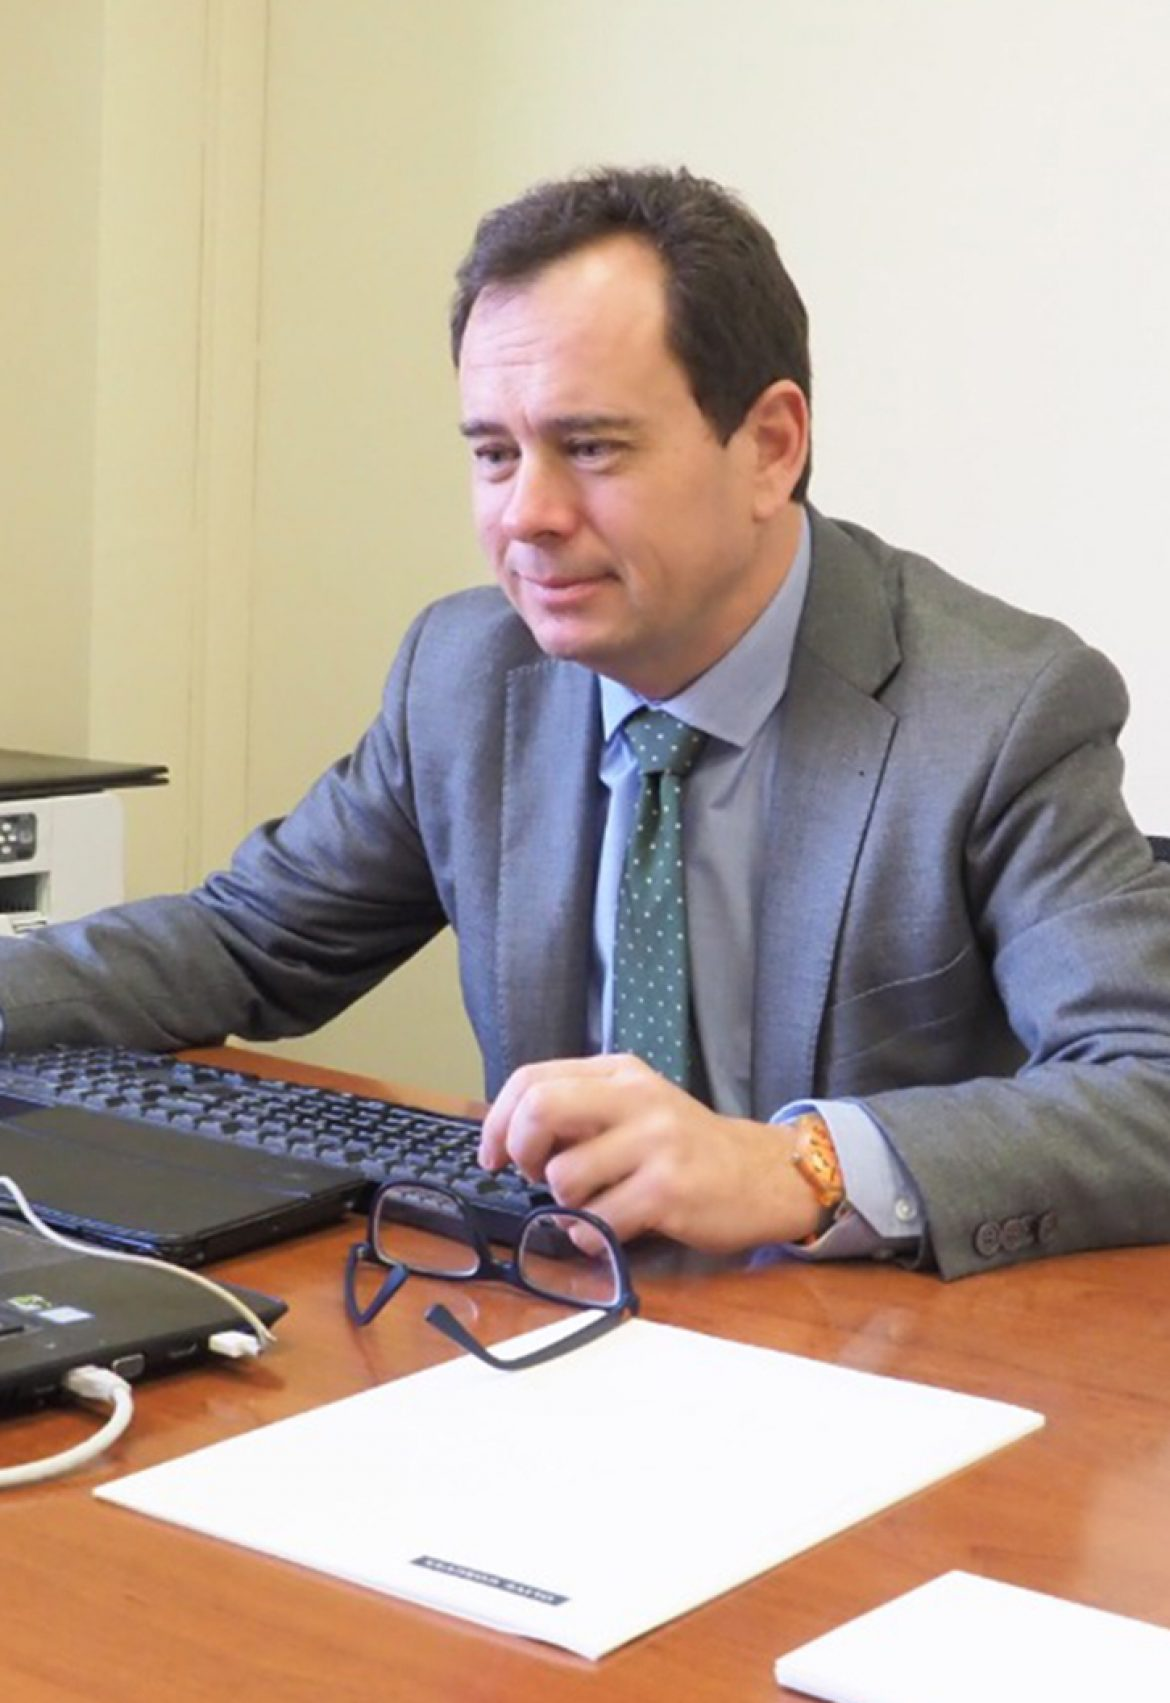 Alfonso Olivé Gorgues